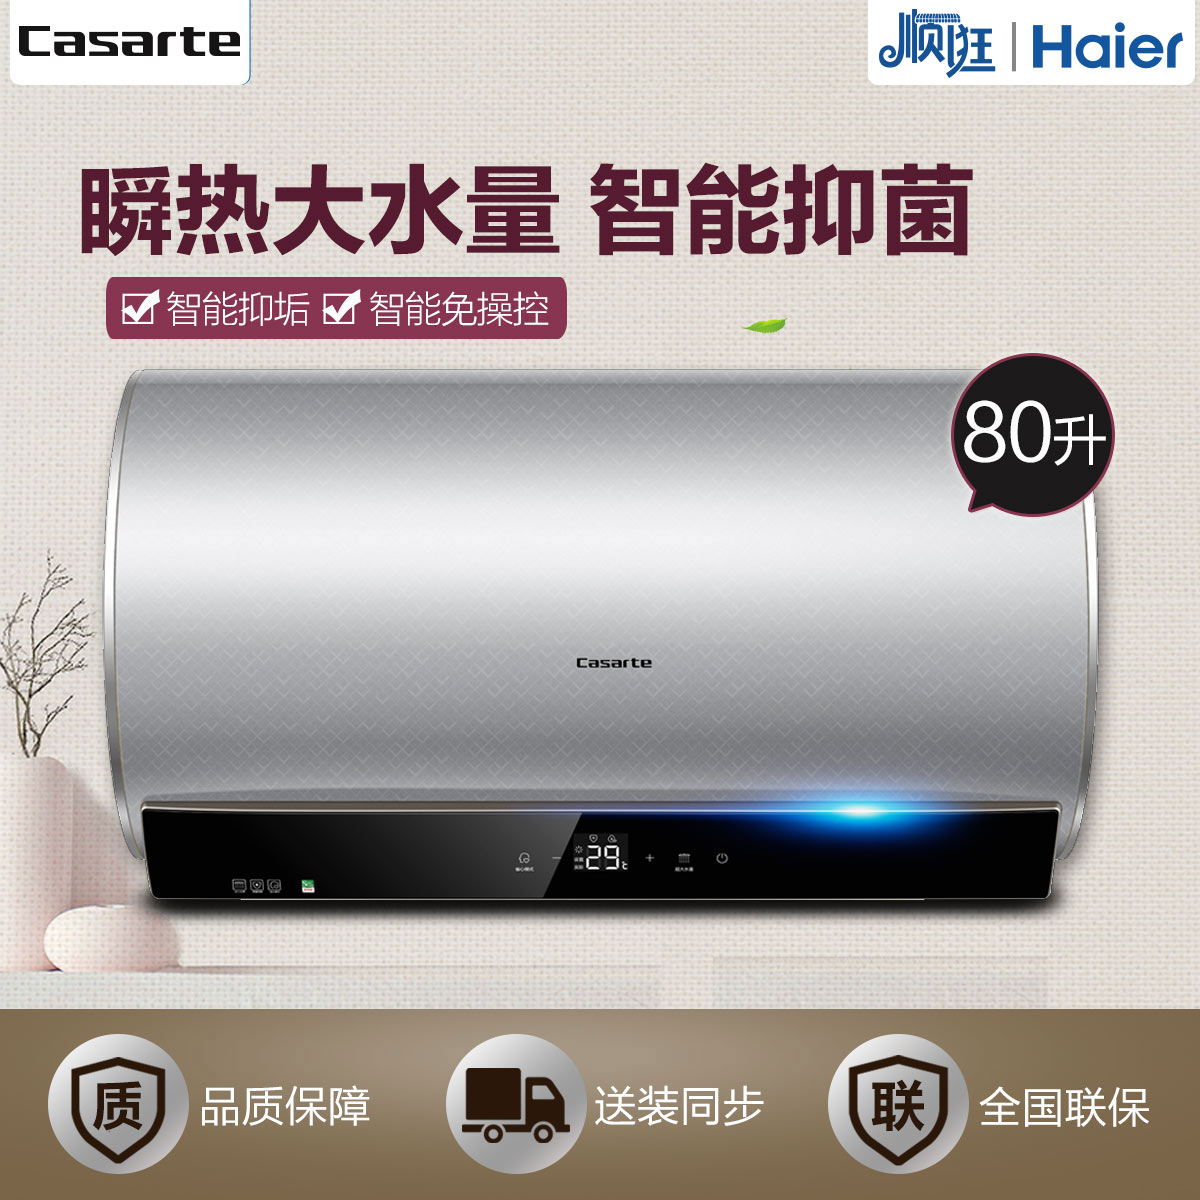 Casarte/卡萨帝             热水器             CEH-80V(银)